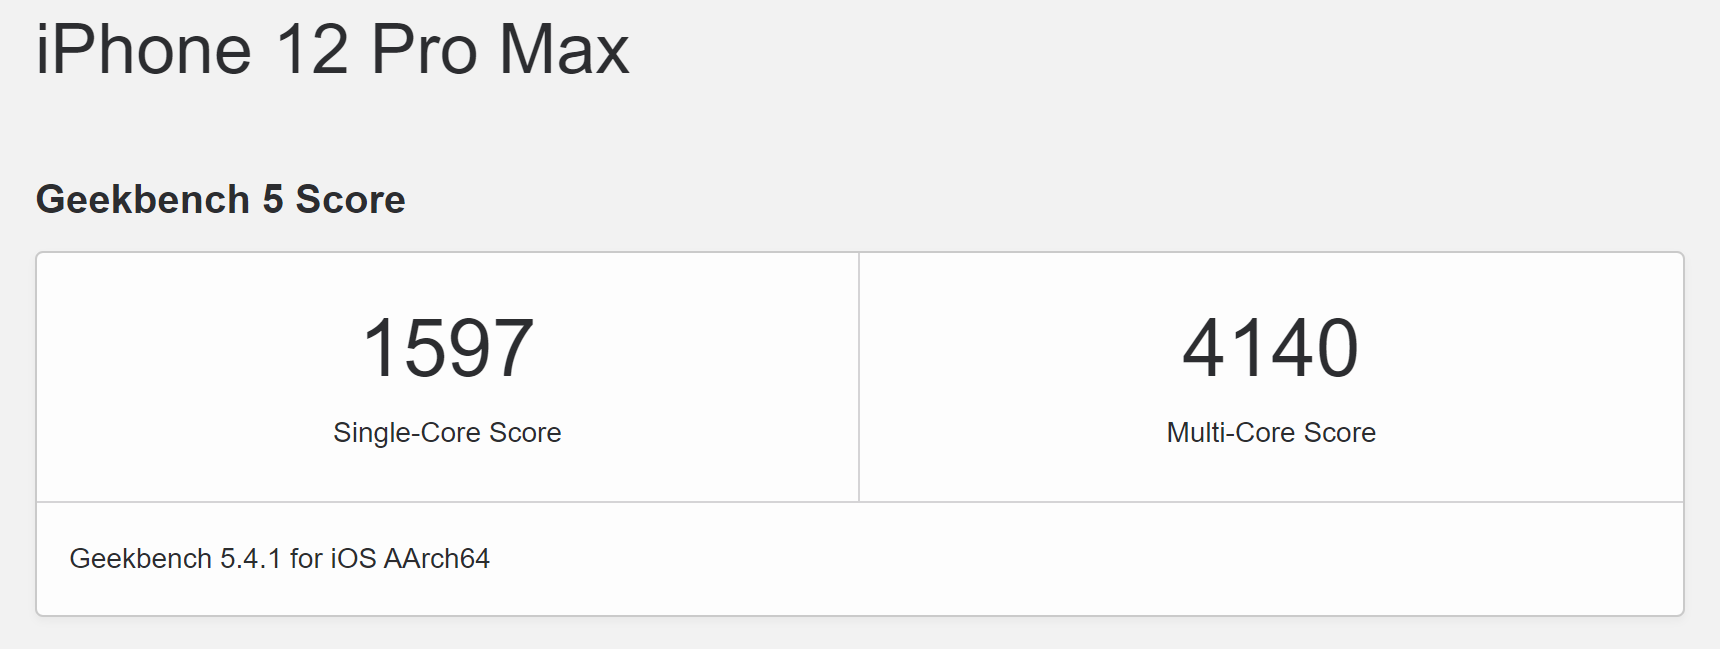 iPhone 12 Pro Max Geekbench 5